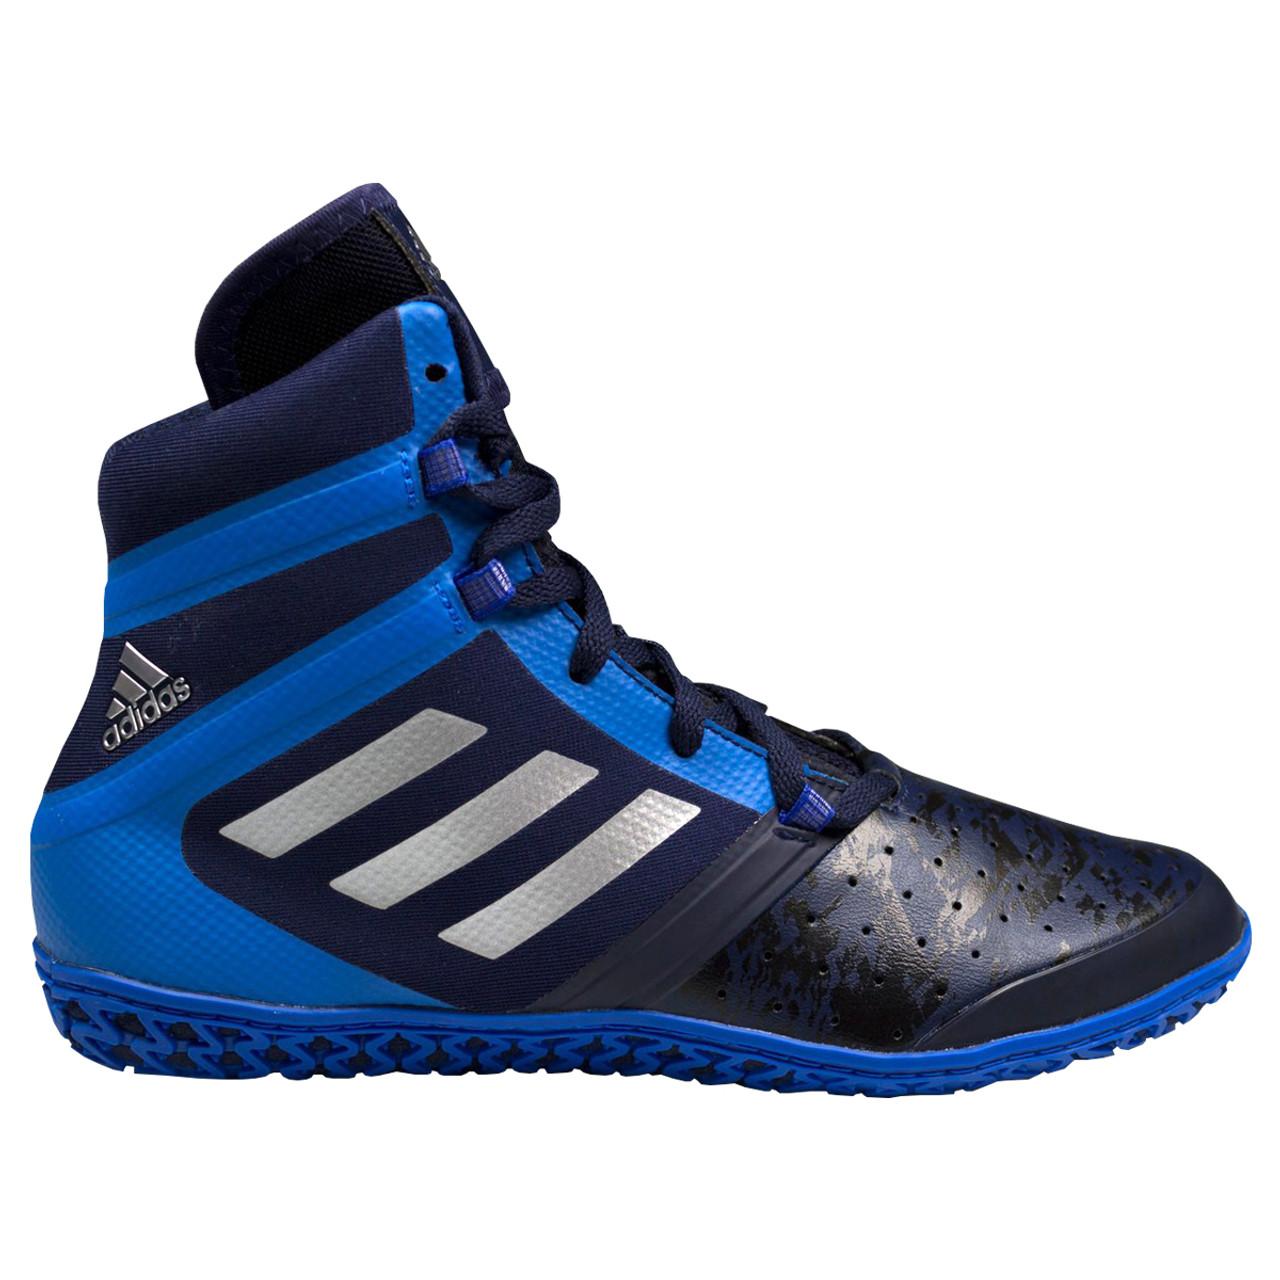 Adidas Impact Wrestling Shoes | Navy